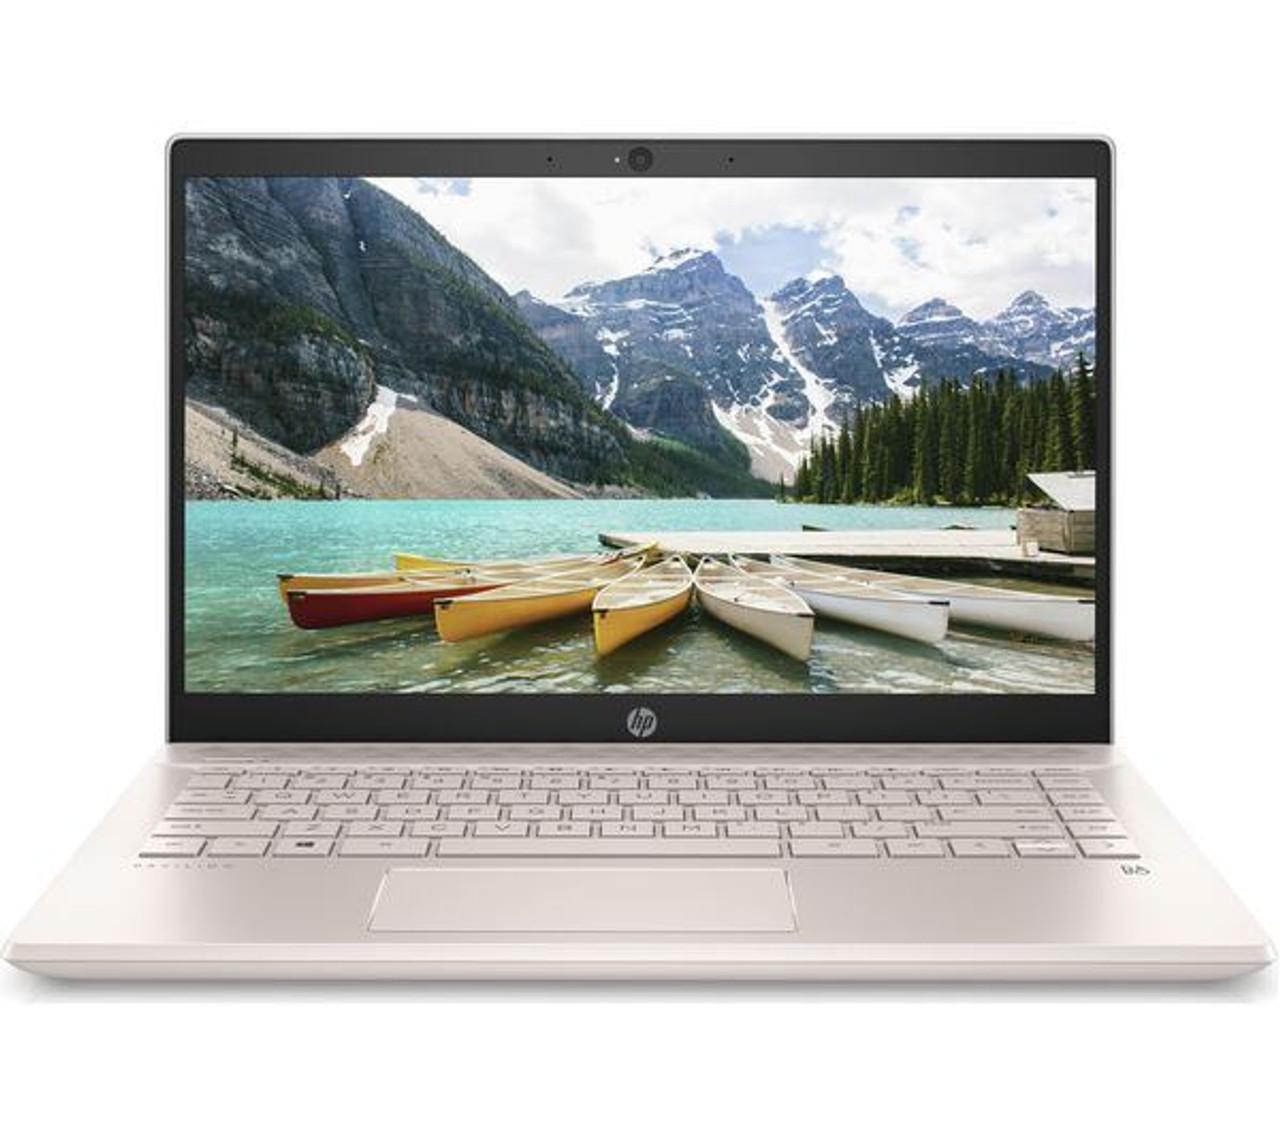 HP Pavilion 14-ce0597sa Intel Core i3 8130U 8GB 128GB SSD Windows 10 Laptop